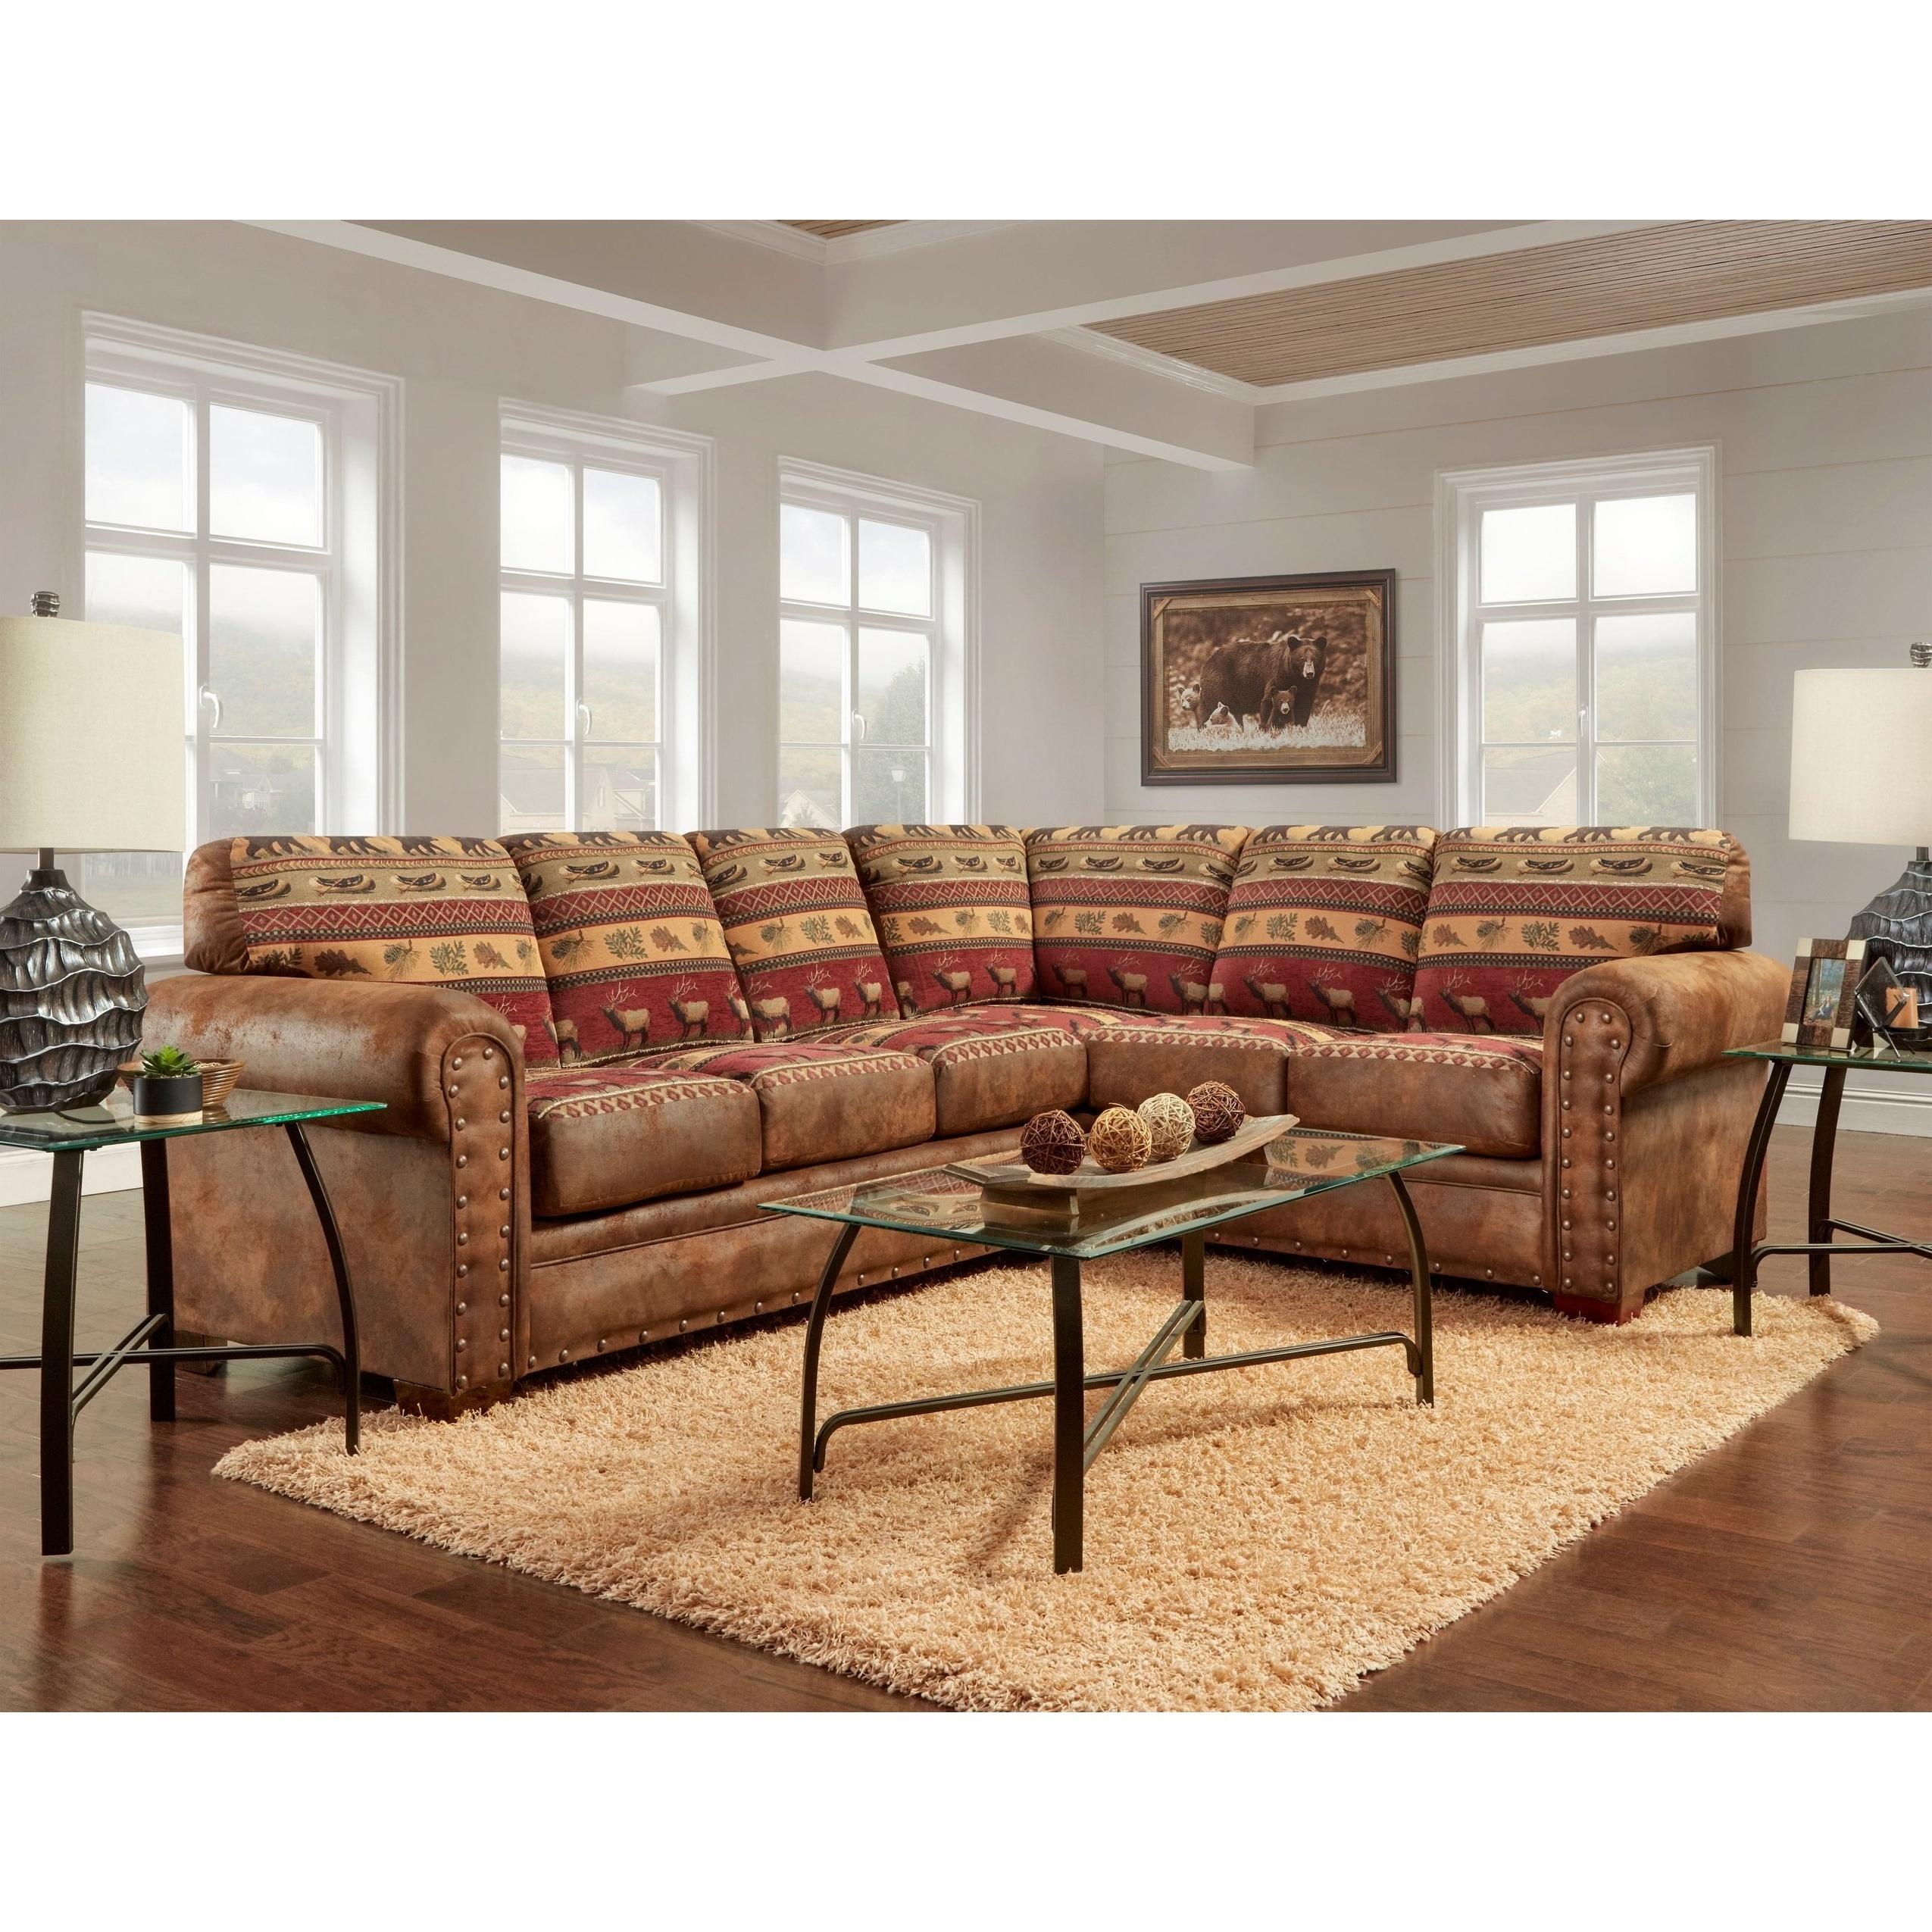 Shop American Furniture Classics Model B1650k Sierra Lodge Two Piece With Regard To Favorite Sierra Foam Ii 3 Piece Sectionals (View 14 of 20)